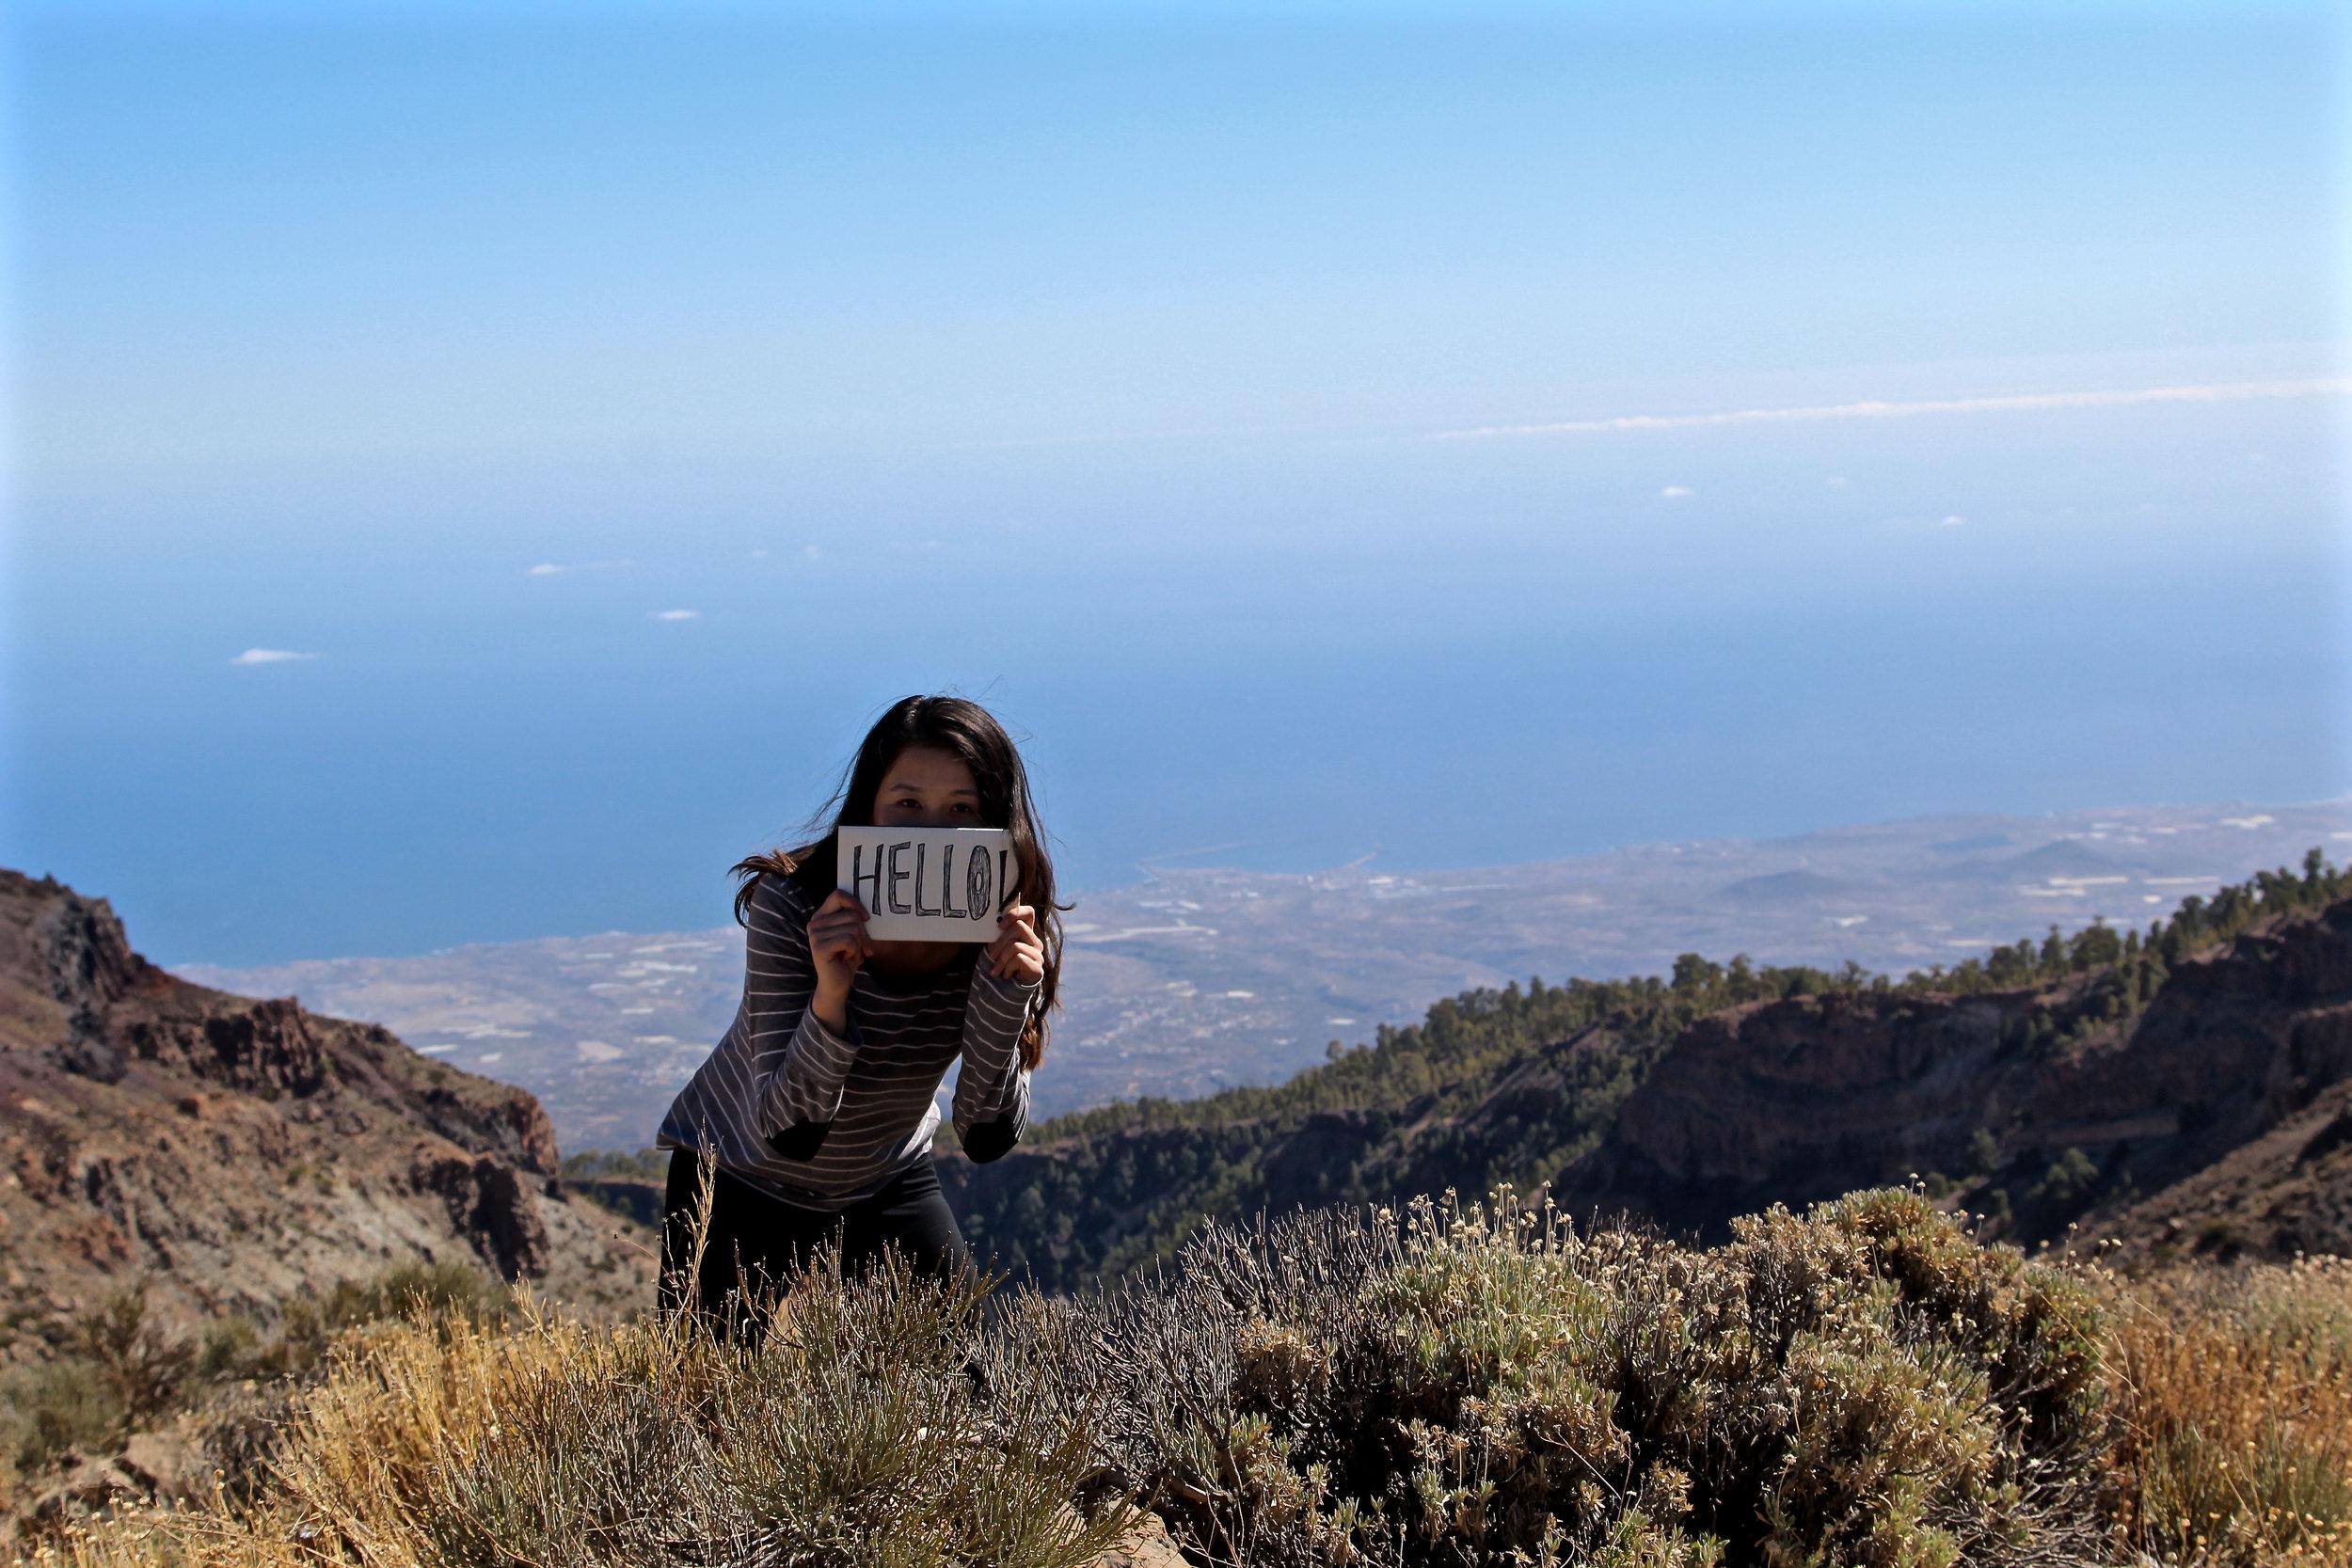 Hello from Tenerife